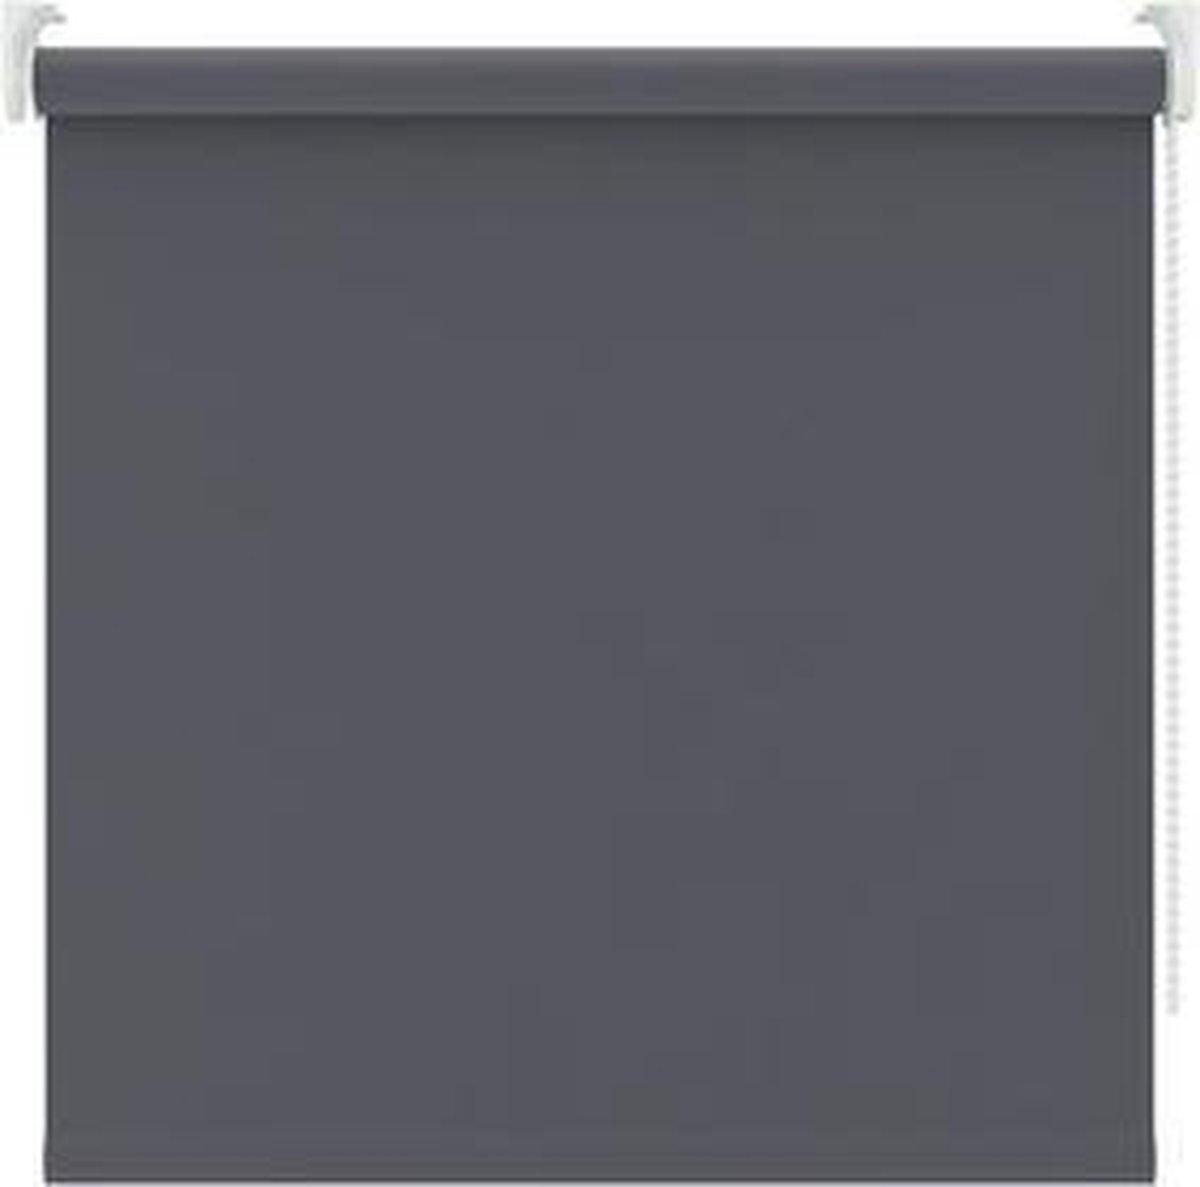 Decosol Rolgordijn Verduisterend - 90x190 cm - Antraciet